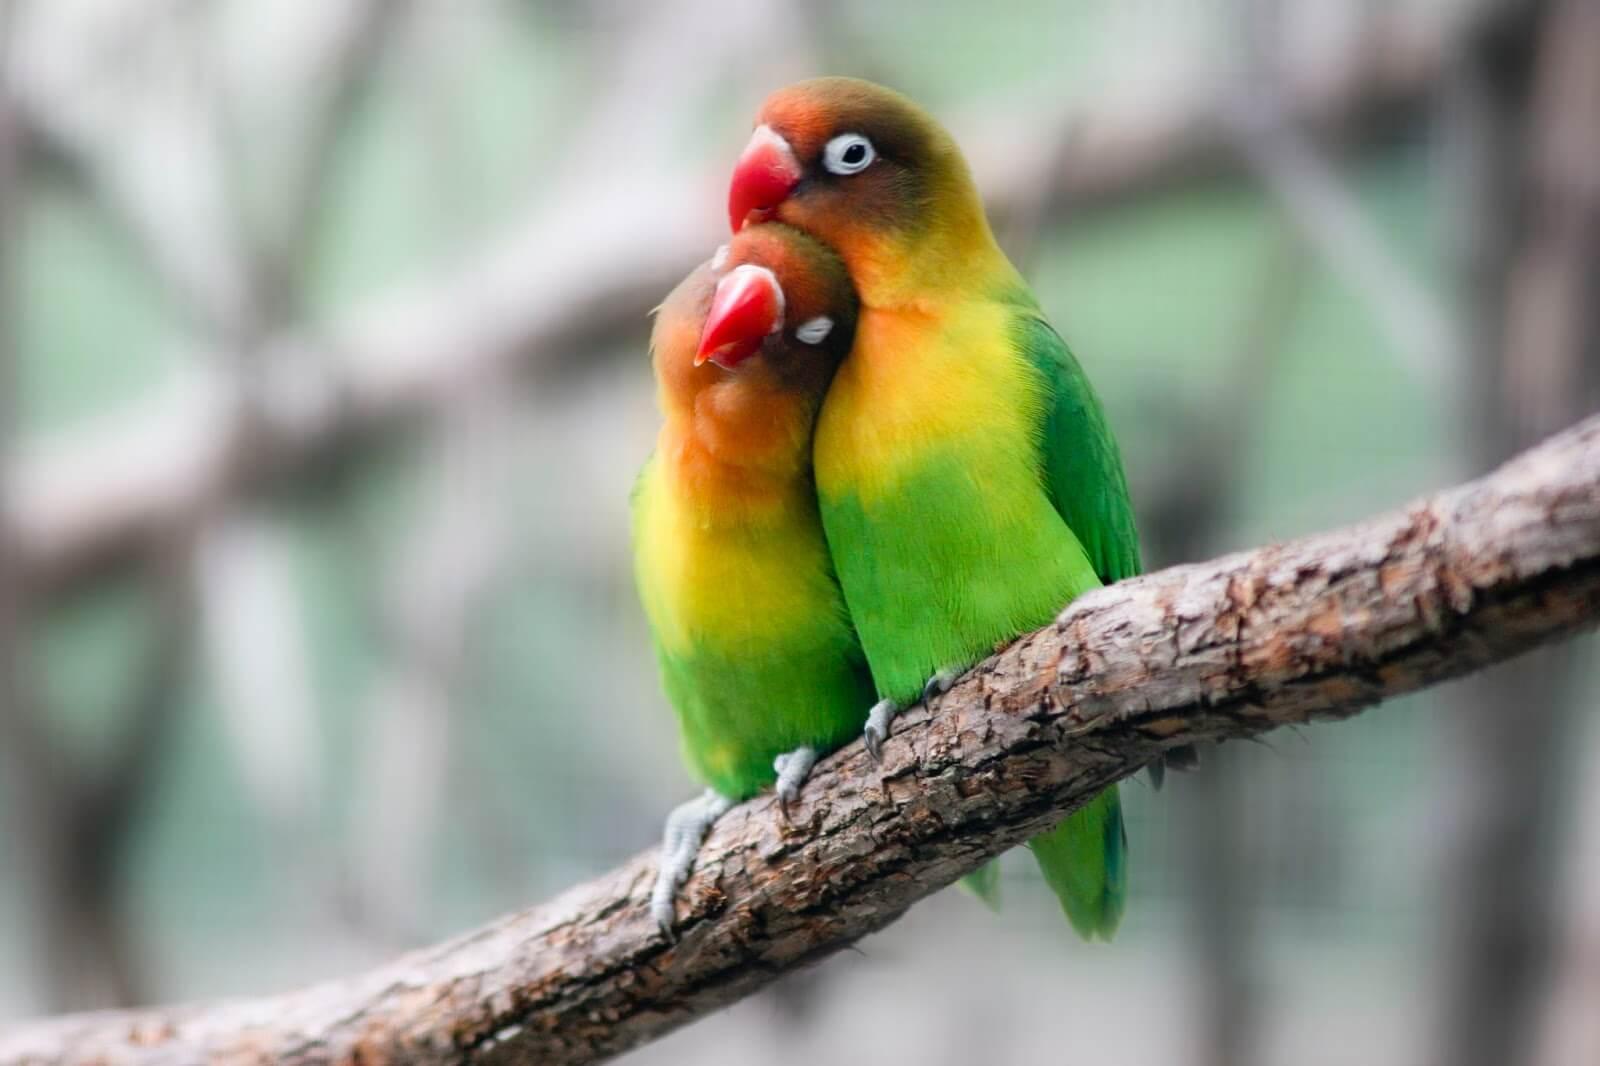 ciri klep dan non klep lovebird jantan maupun betina